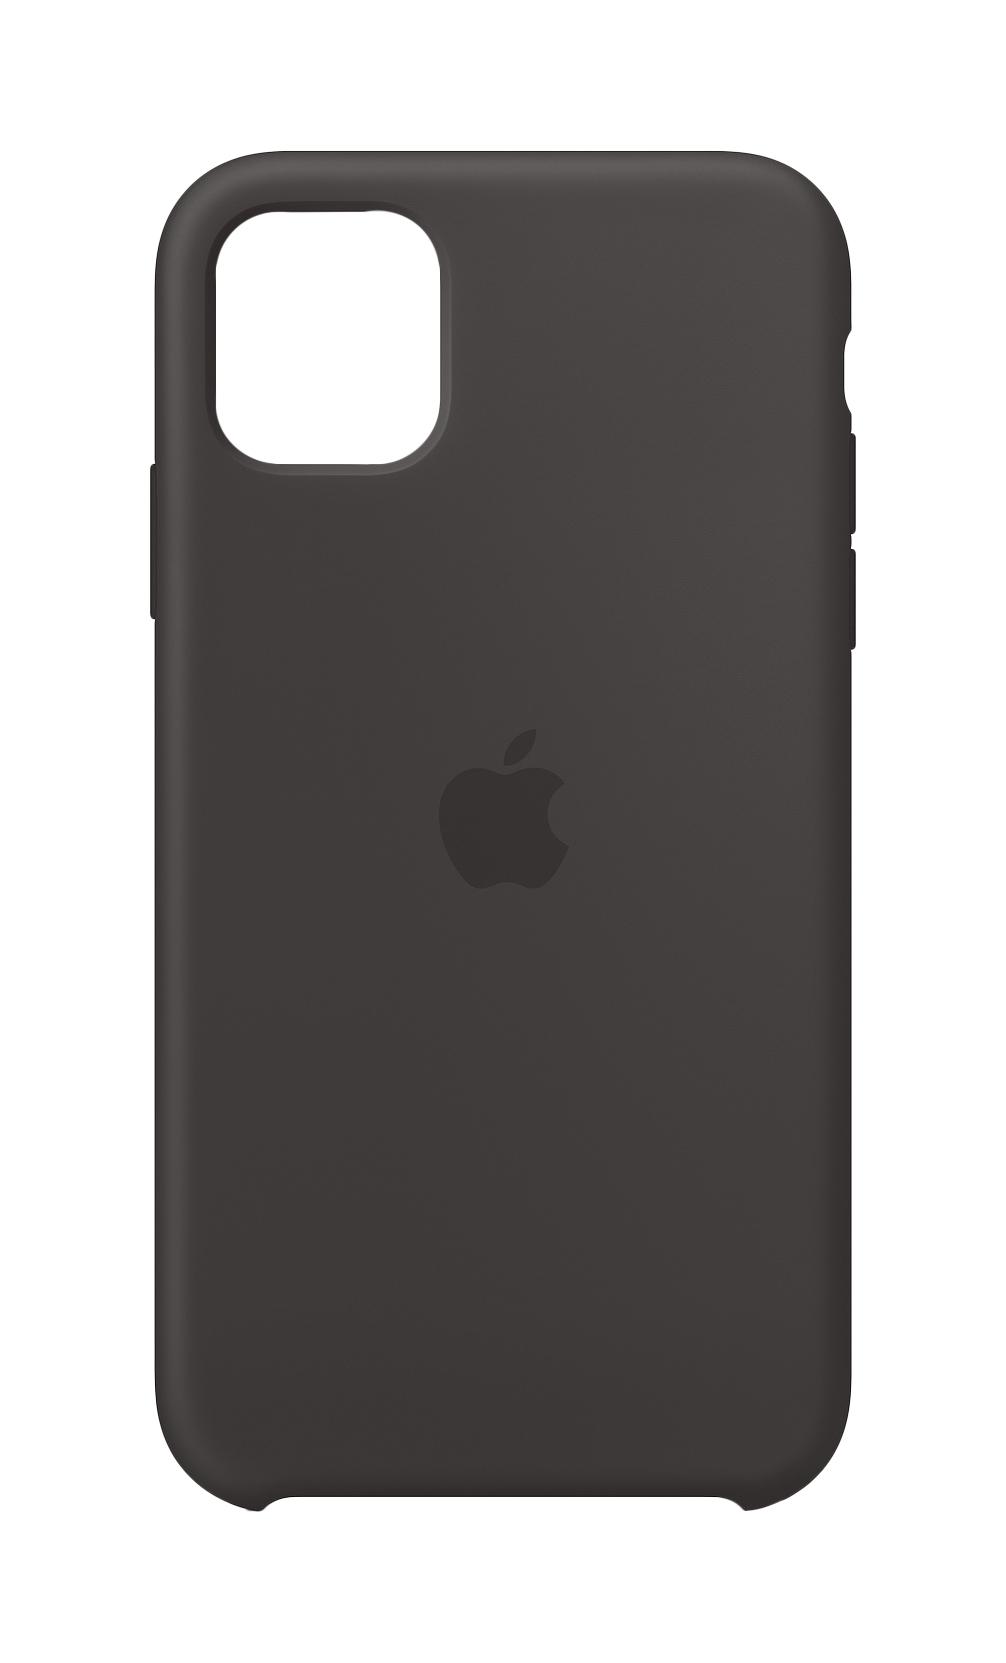 "Apple MWVU2ZM/A funda para teléfono móvil 15,5 cm (6.1"") Negro"